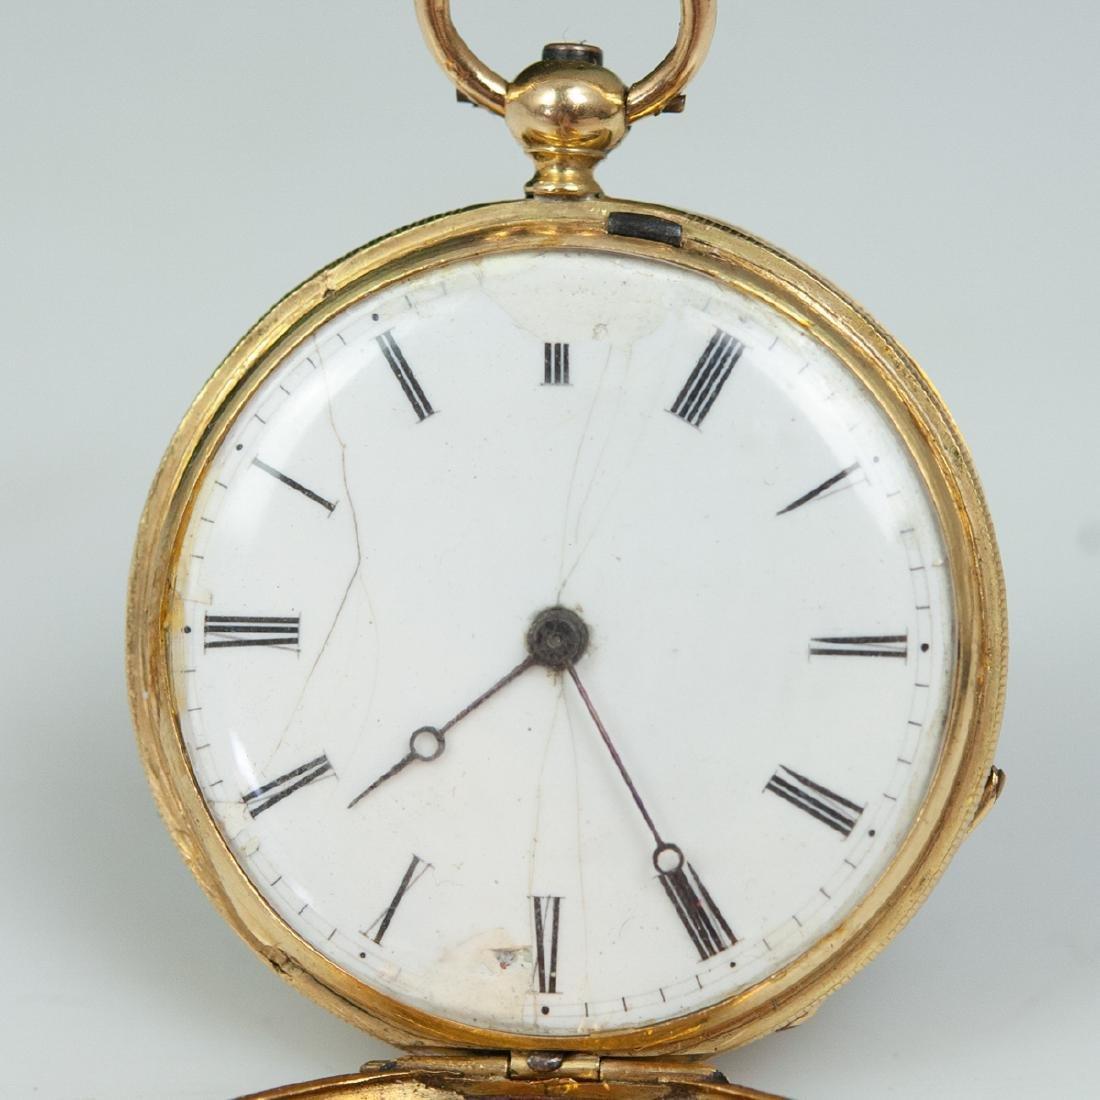 Vacheron 18kt Gold Enameled Pocket Watch - 8